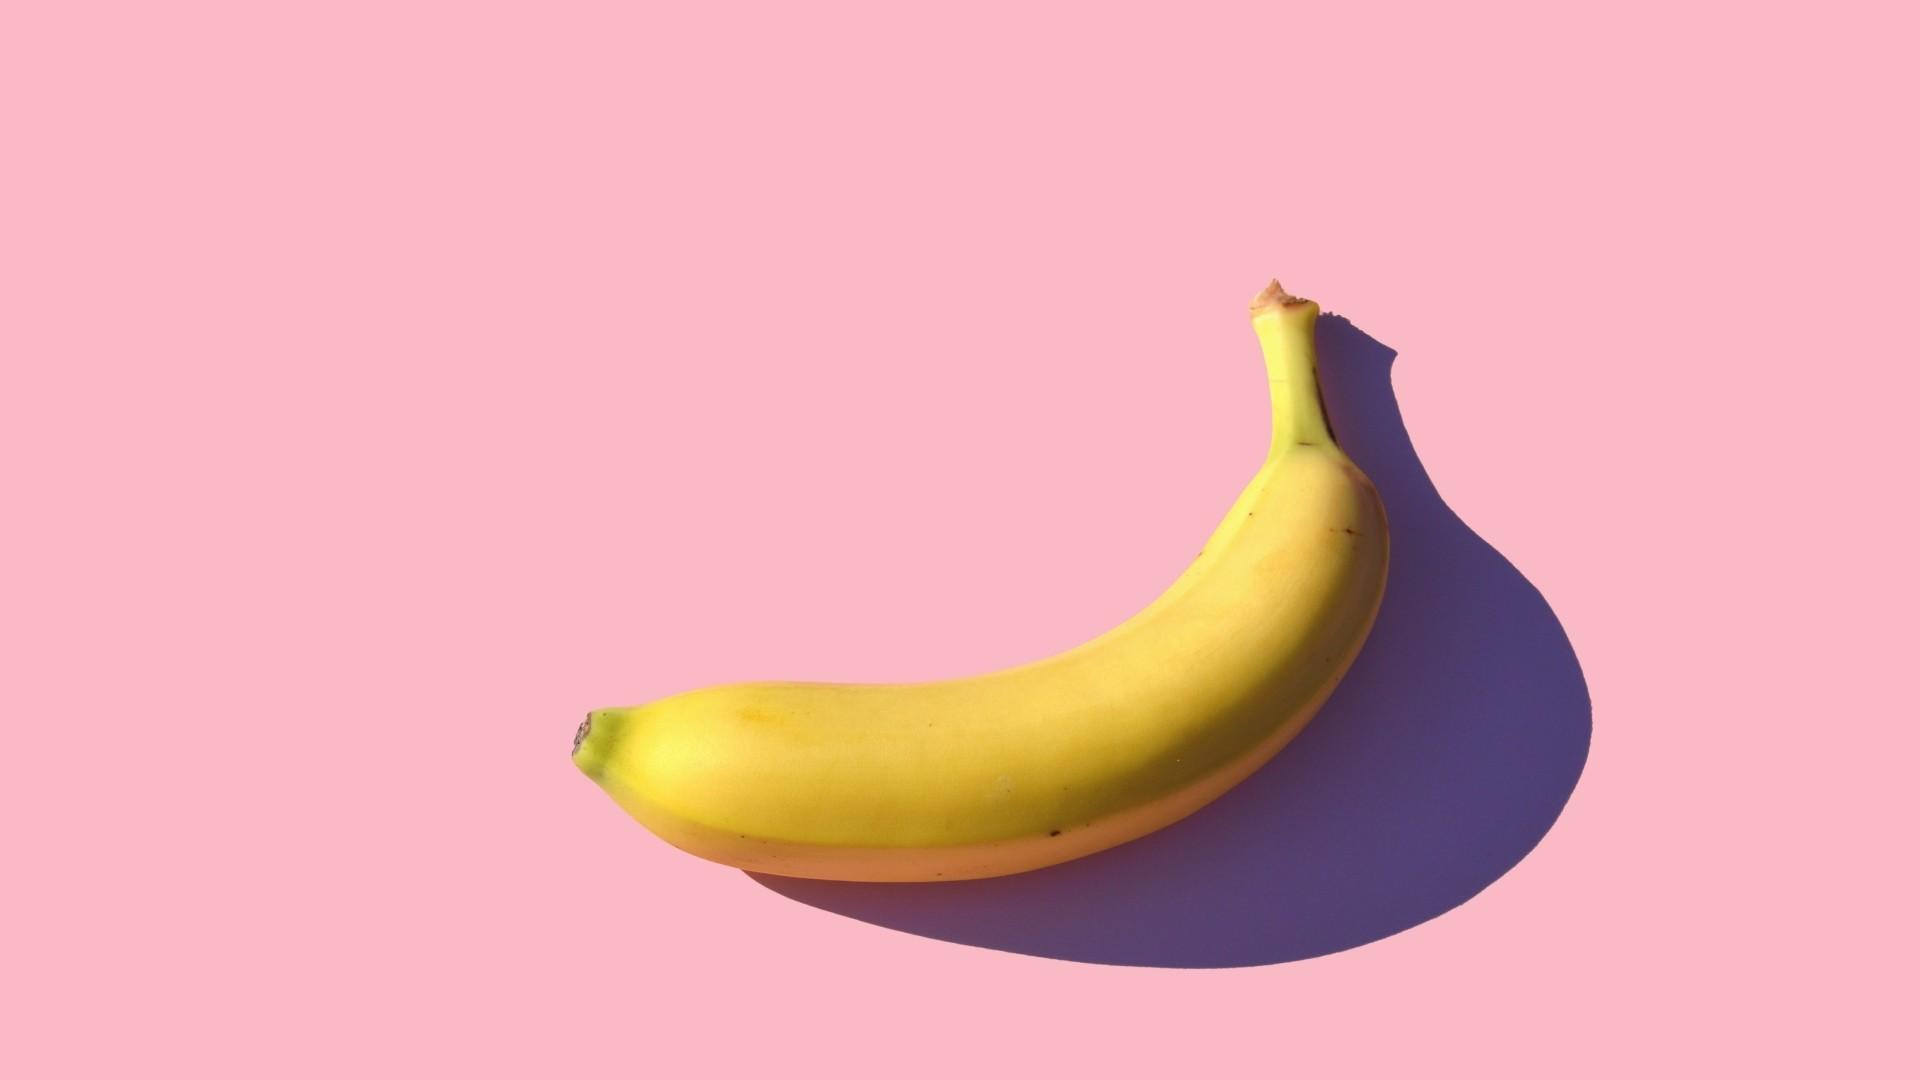 Banana Wallpaper and Background